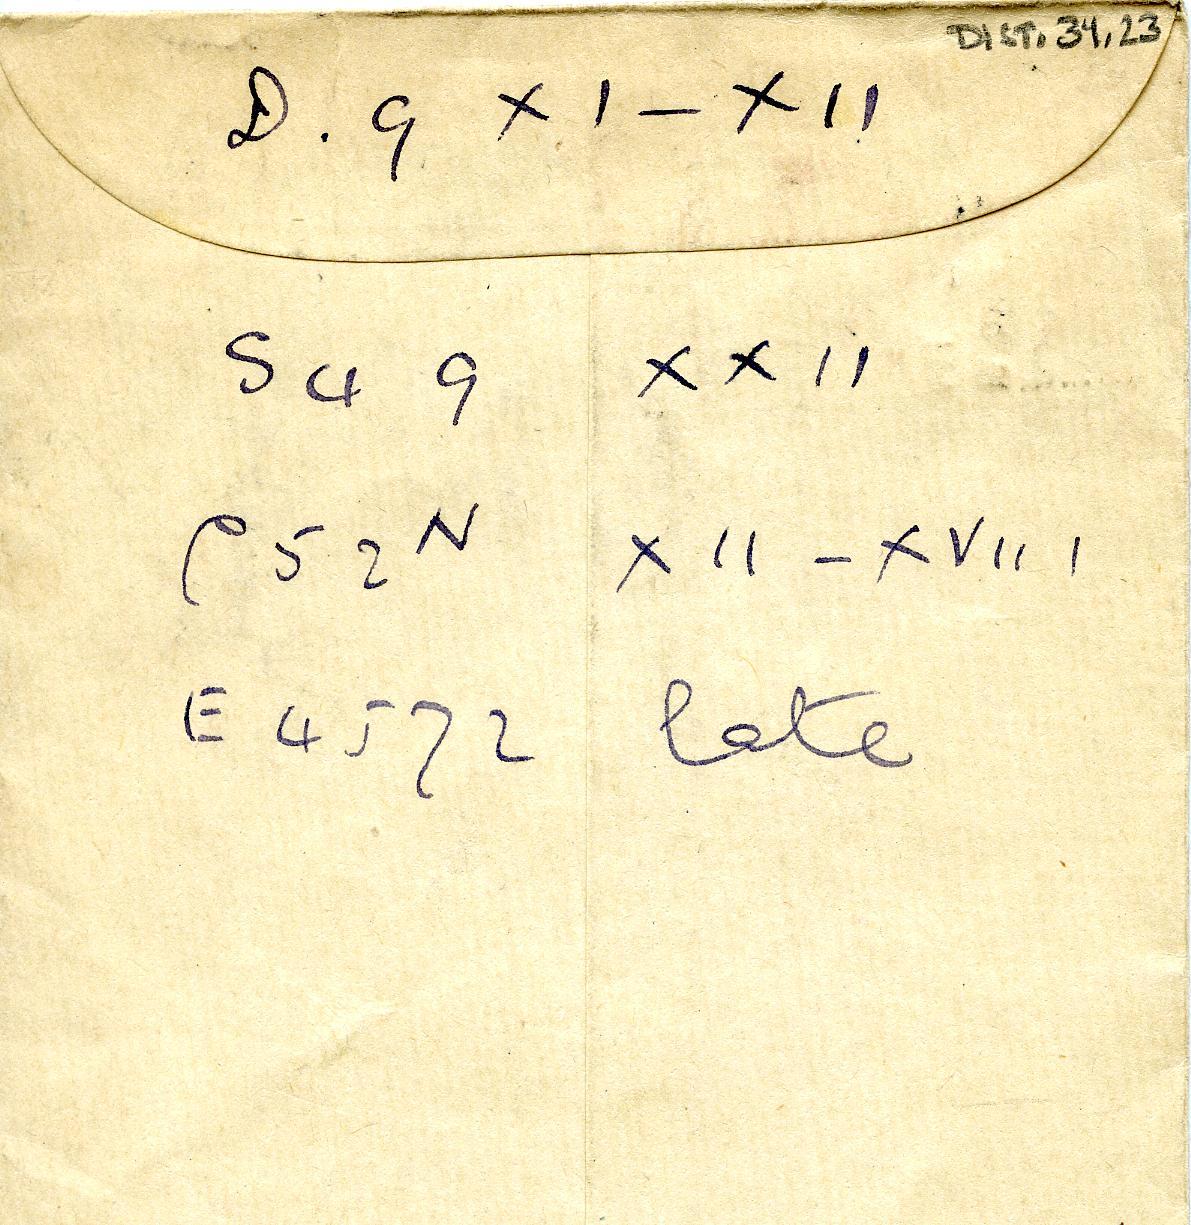 1910-11 Abydos, Atfieh DIST.34.23a